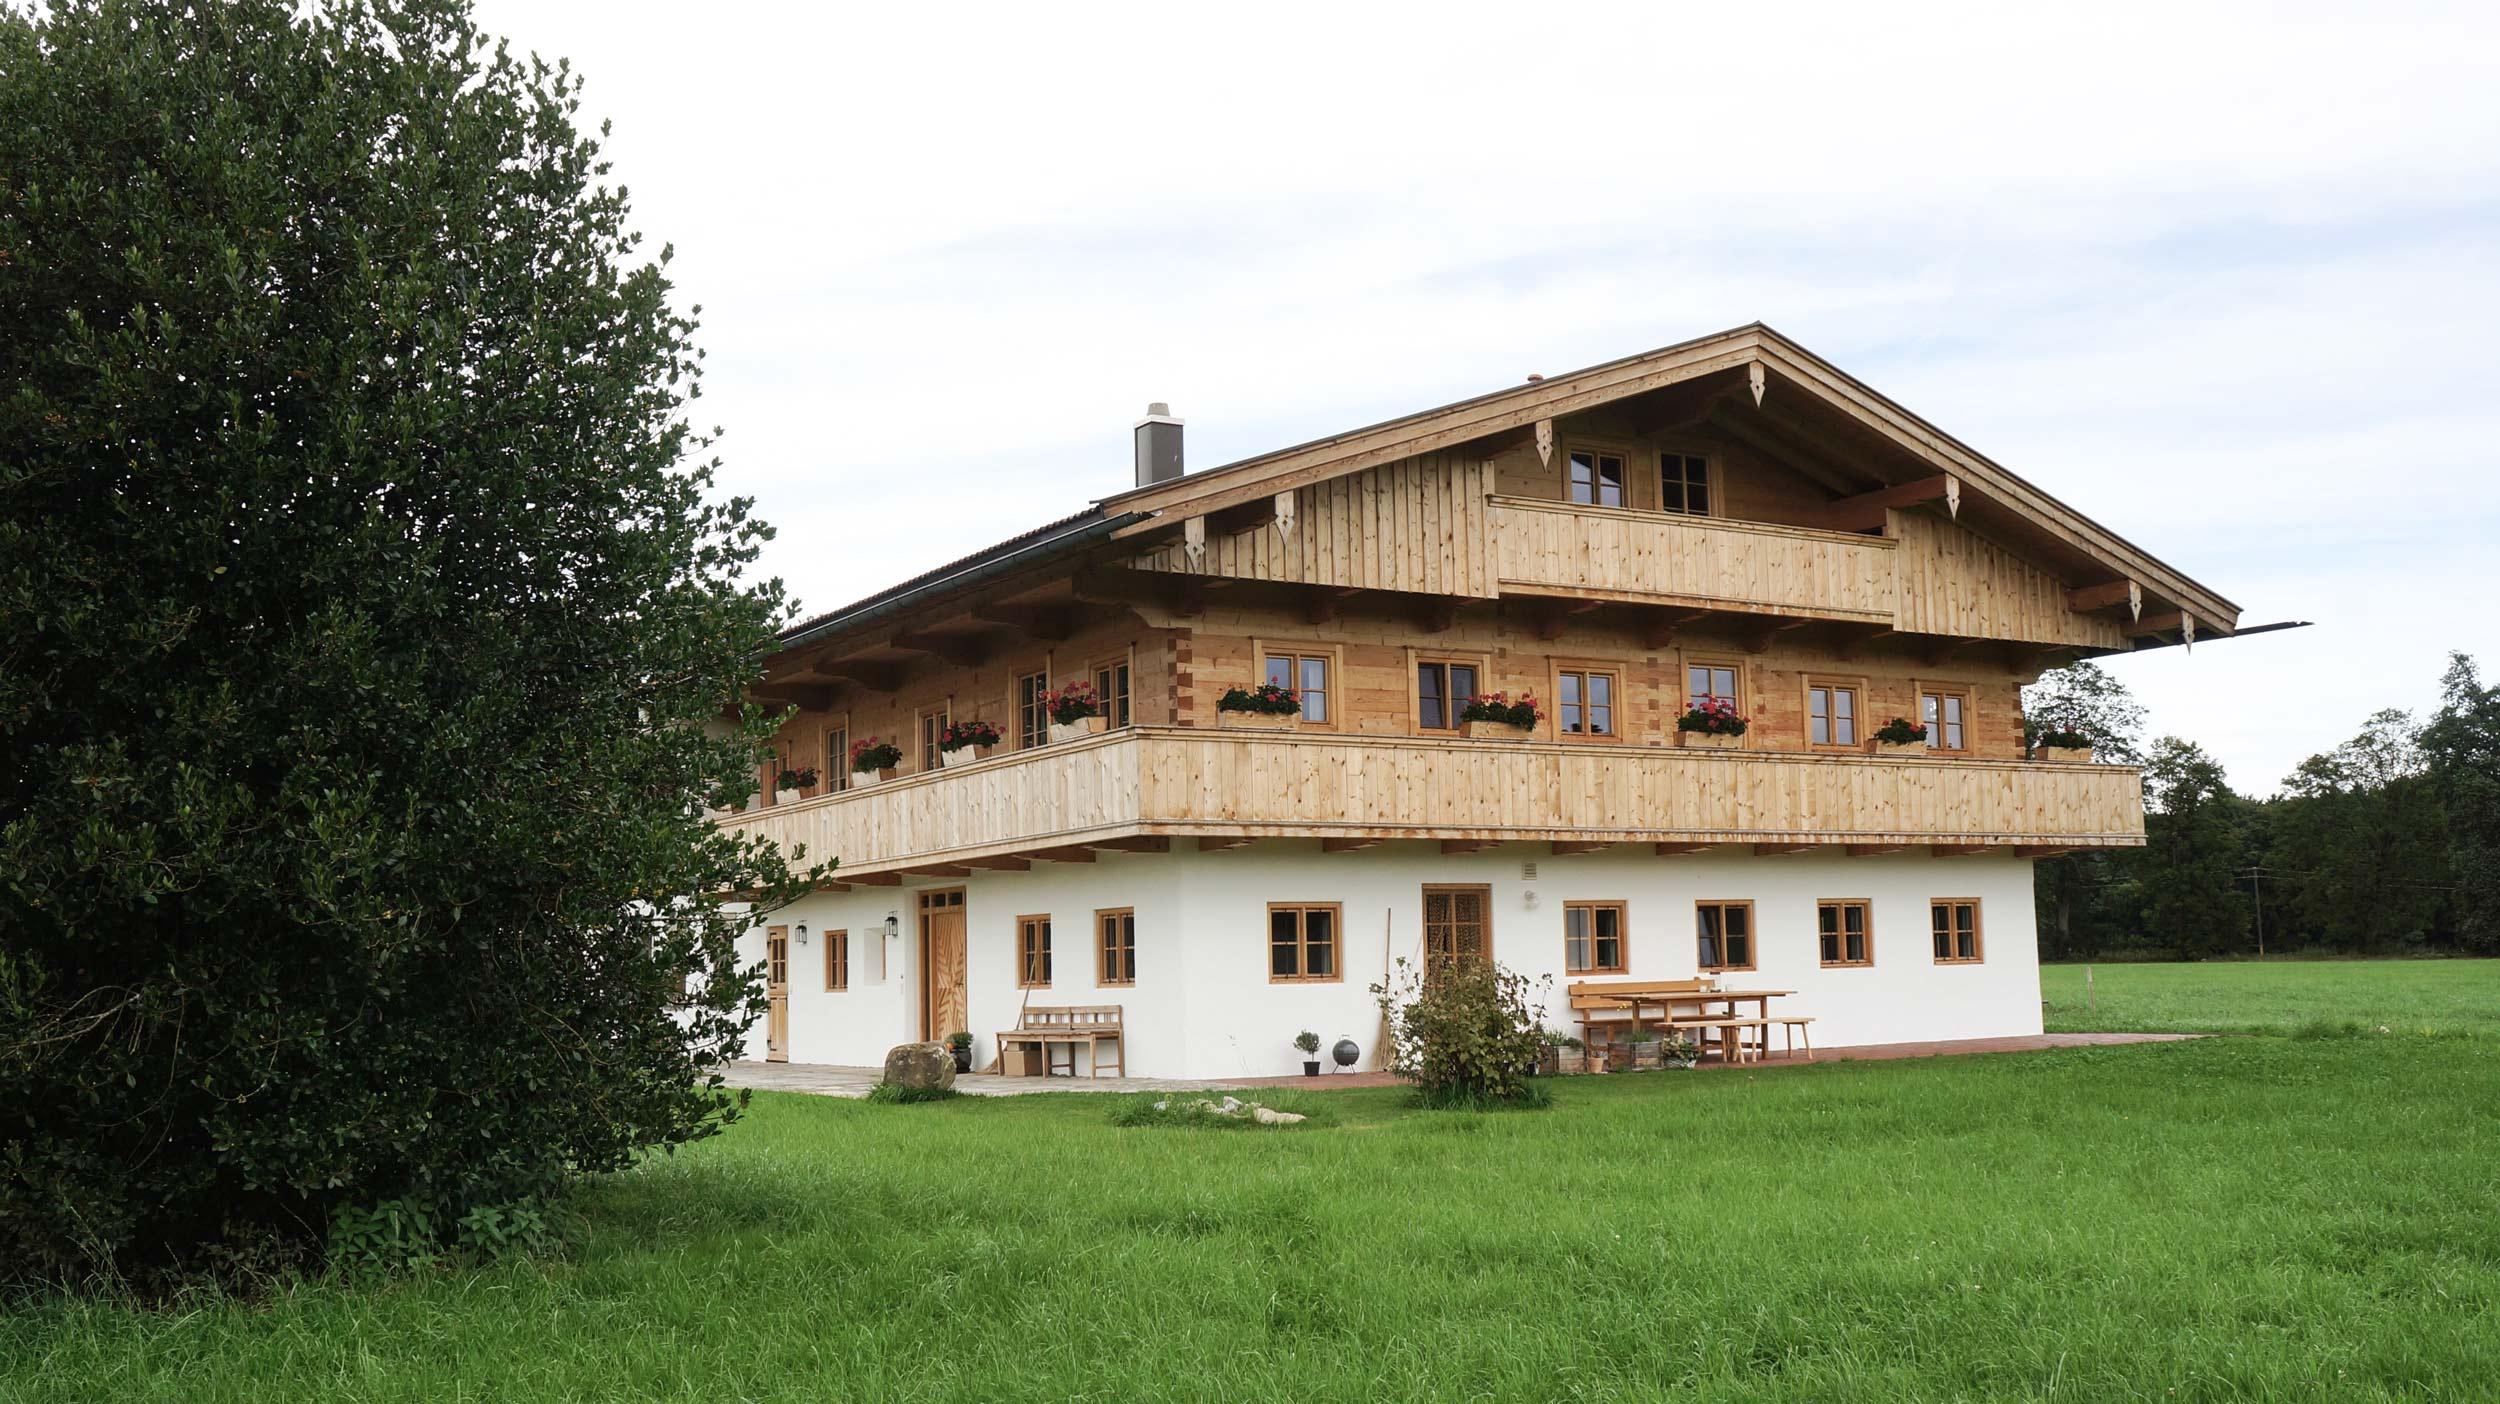 zimmerei-stoib-holzbau-holzhaus-bauernhof-sanierung-umbau-blockhaus-balkon-warngau-03.jpg